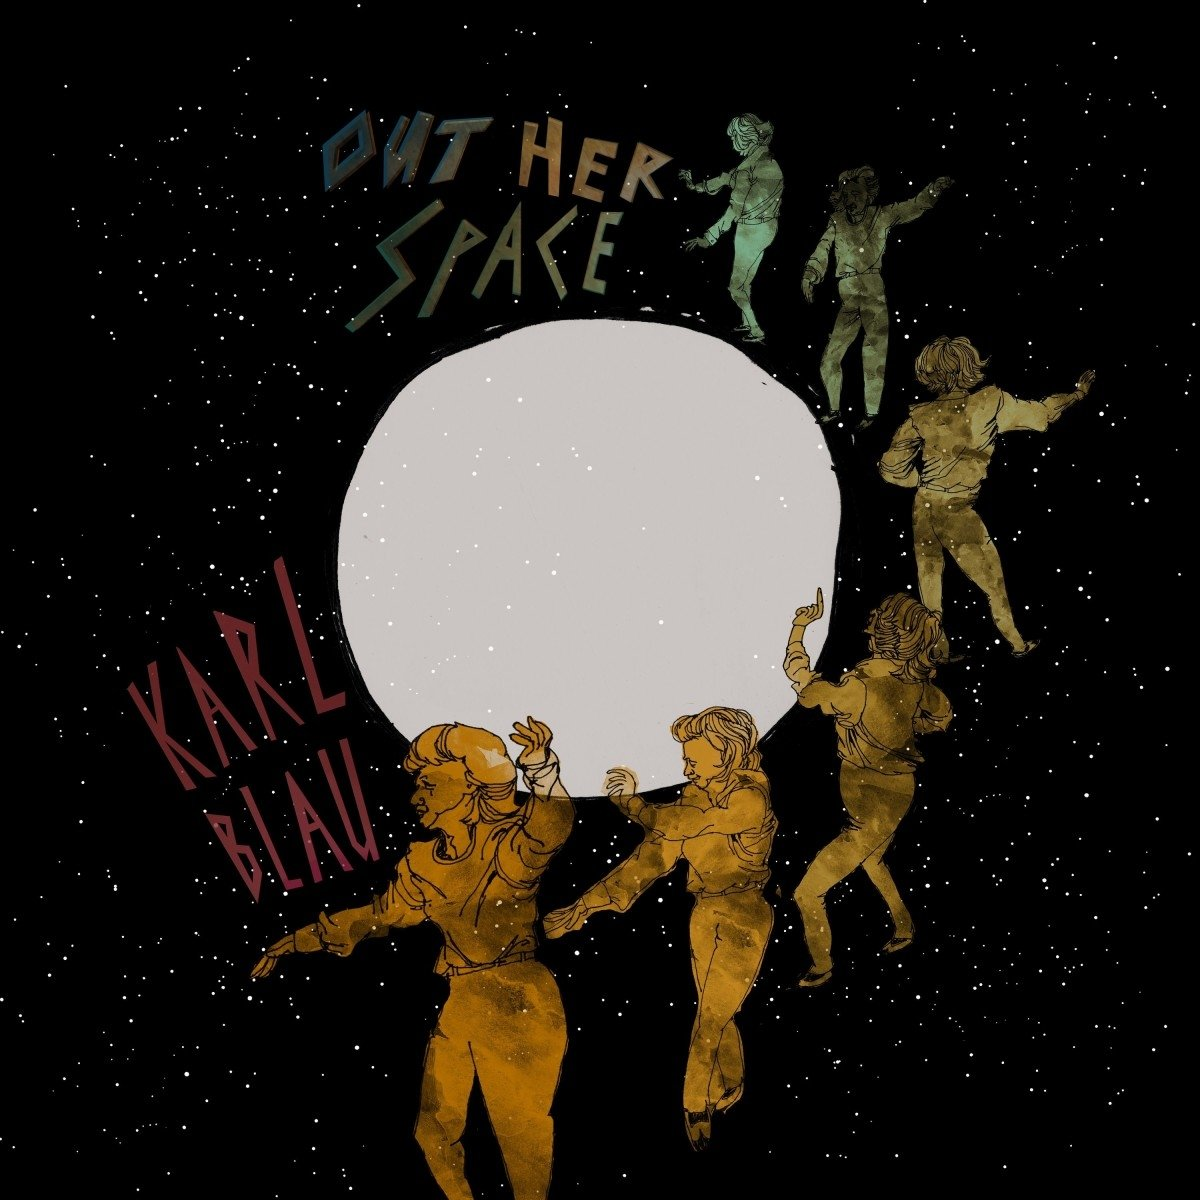 Karl Blau - Out Her Space [LP]